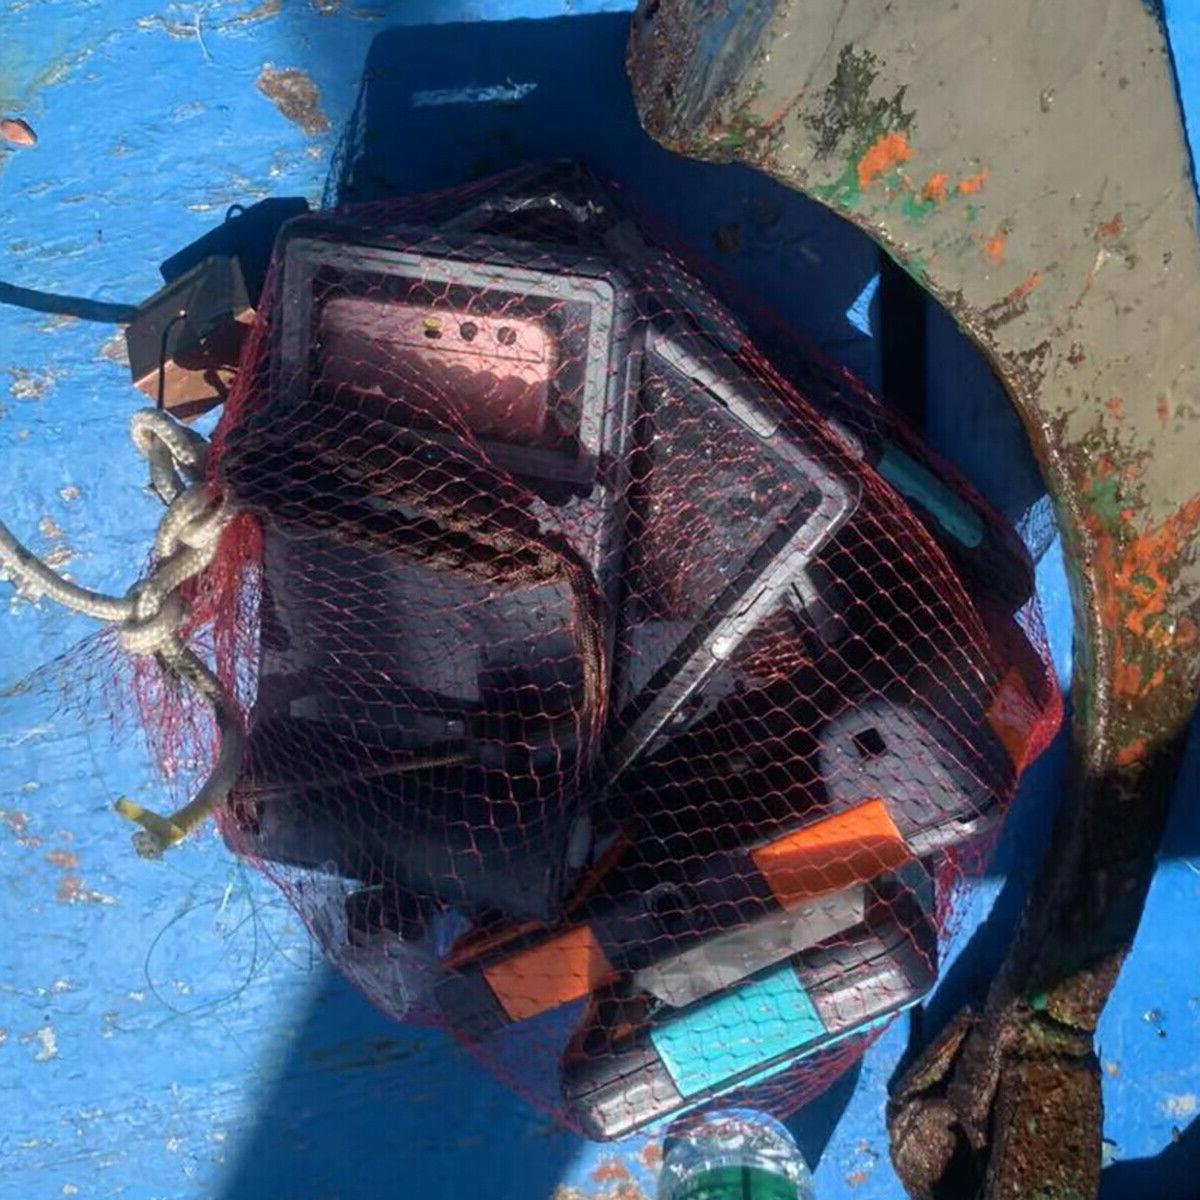 Universal Waterproof Underwater Camera iPhone 11 Pro